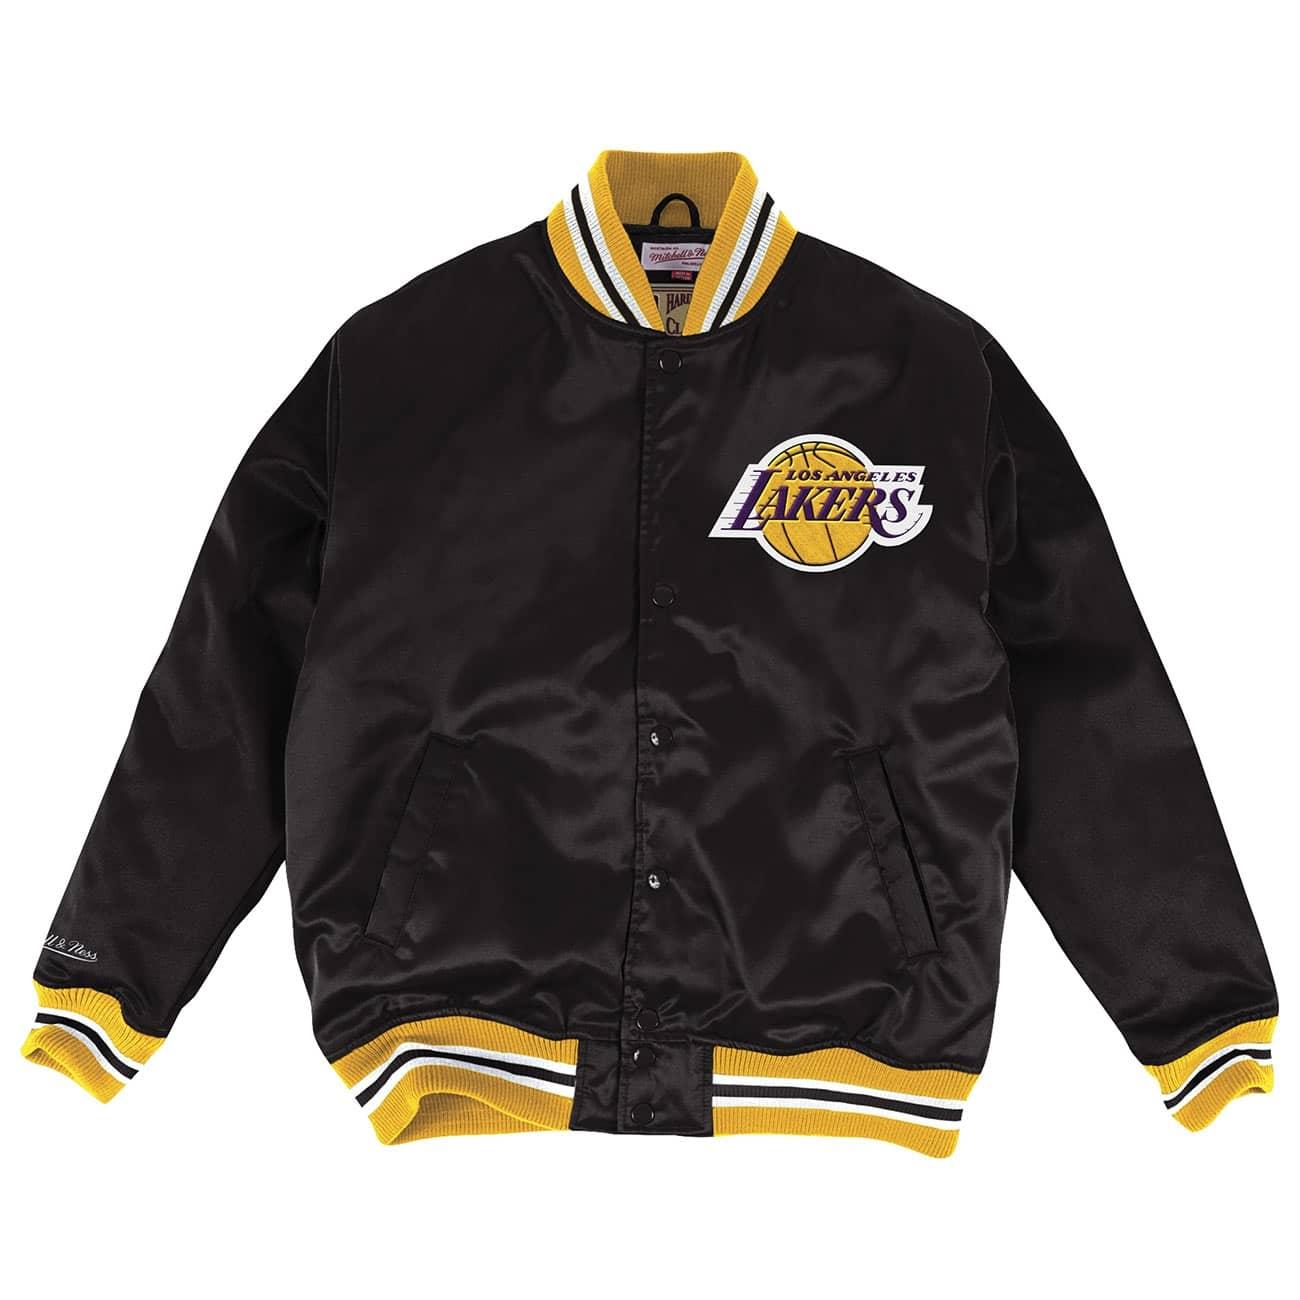 new style c32fd 73ad2 Mitchell   Ness Los Angeles Lakers HWC Satin NBA Jacke Black   TAASS.com  Fan Shop